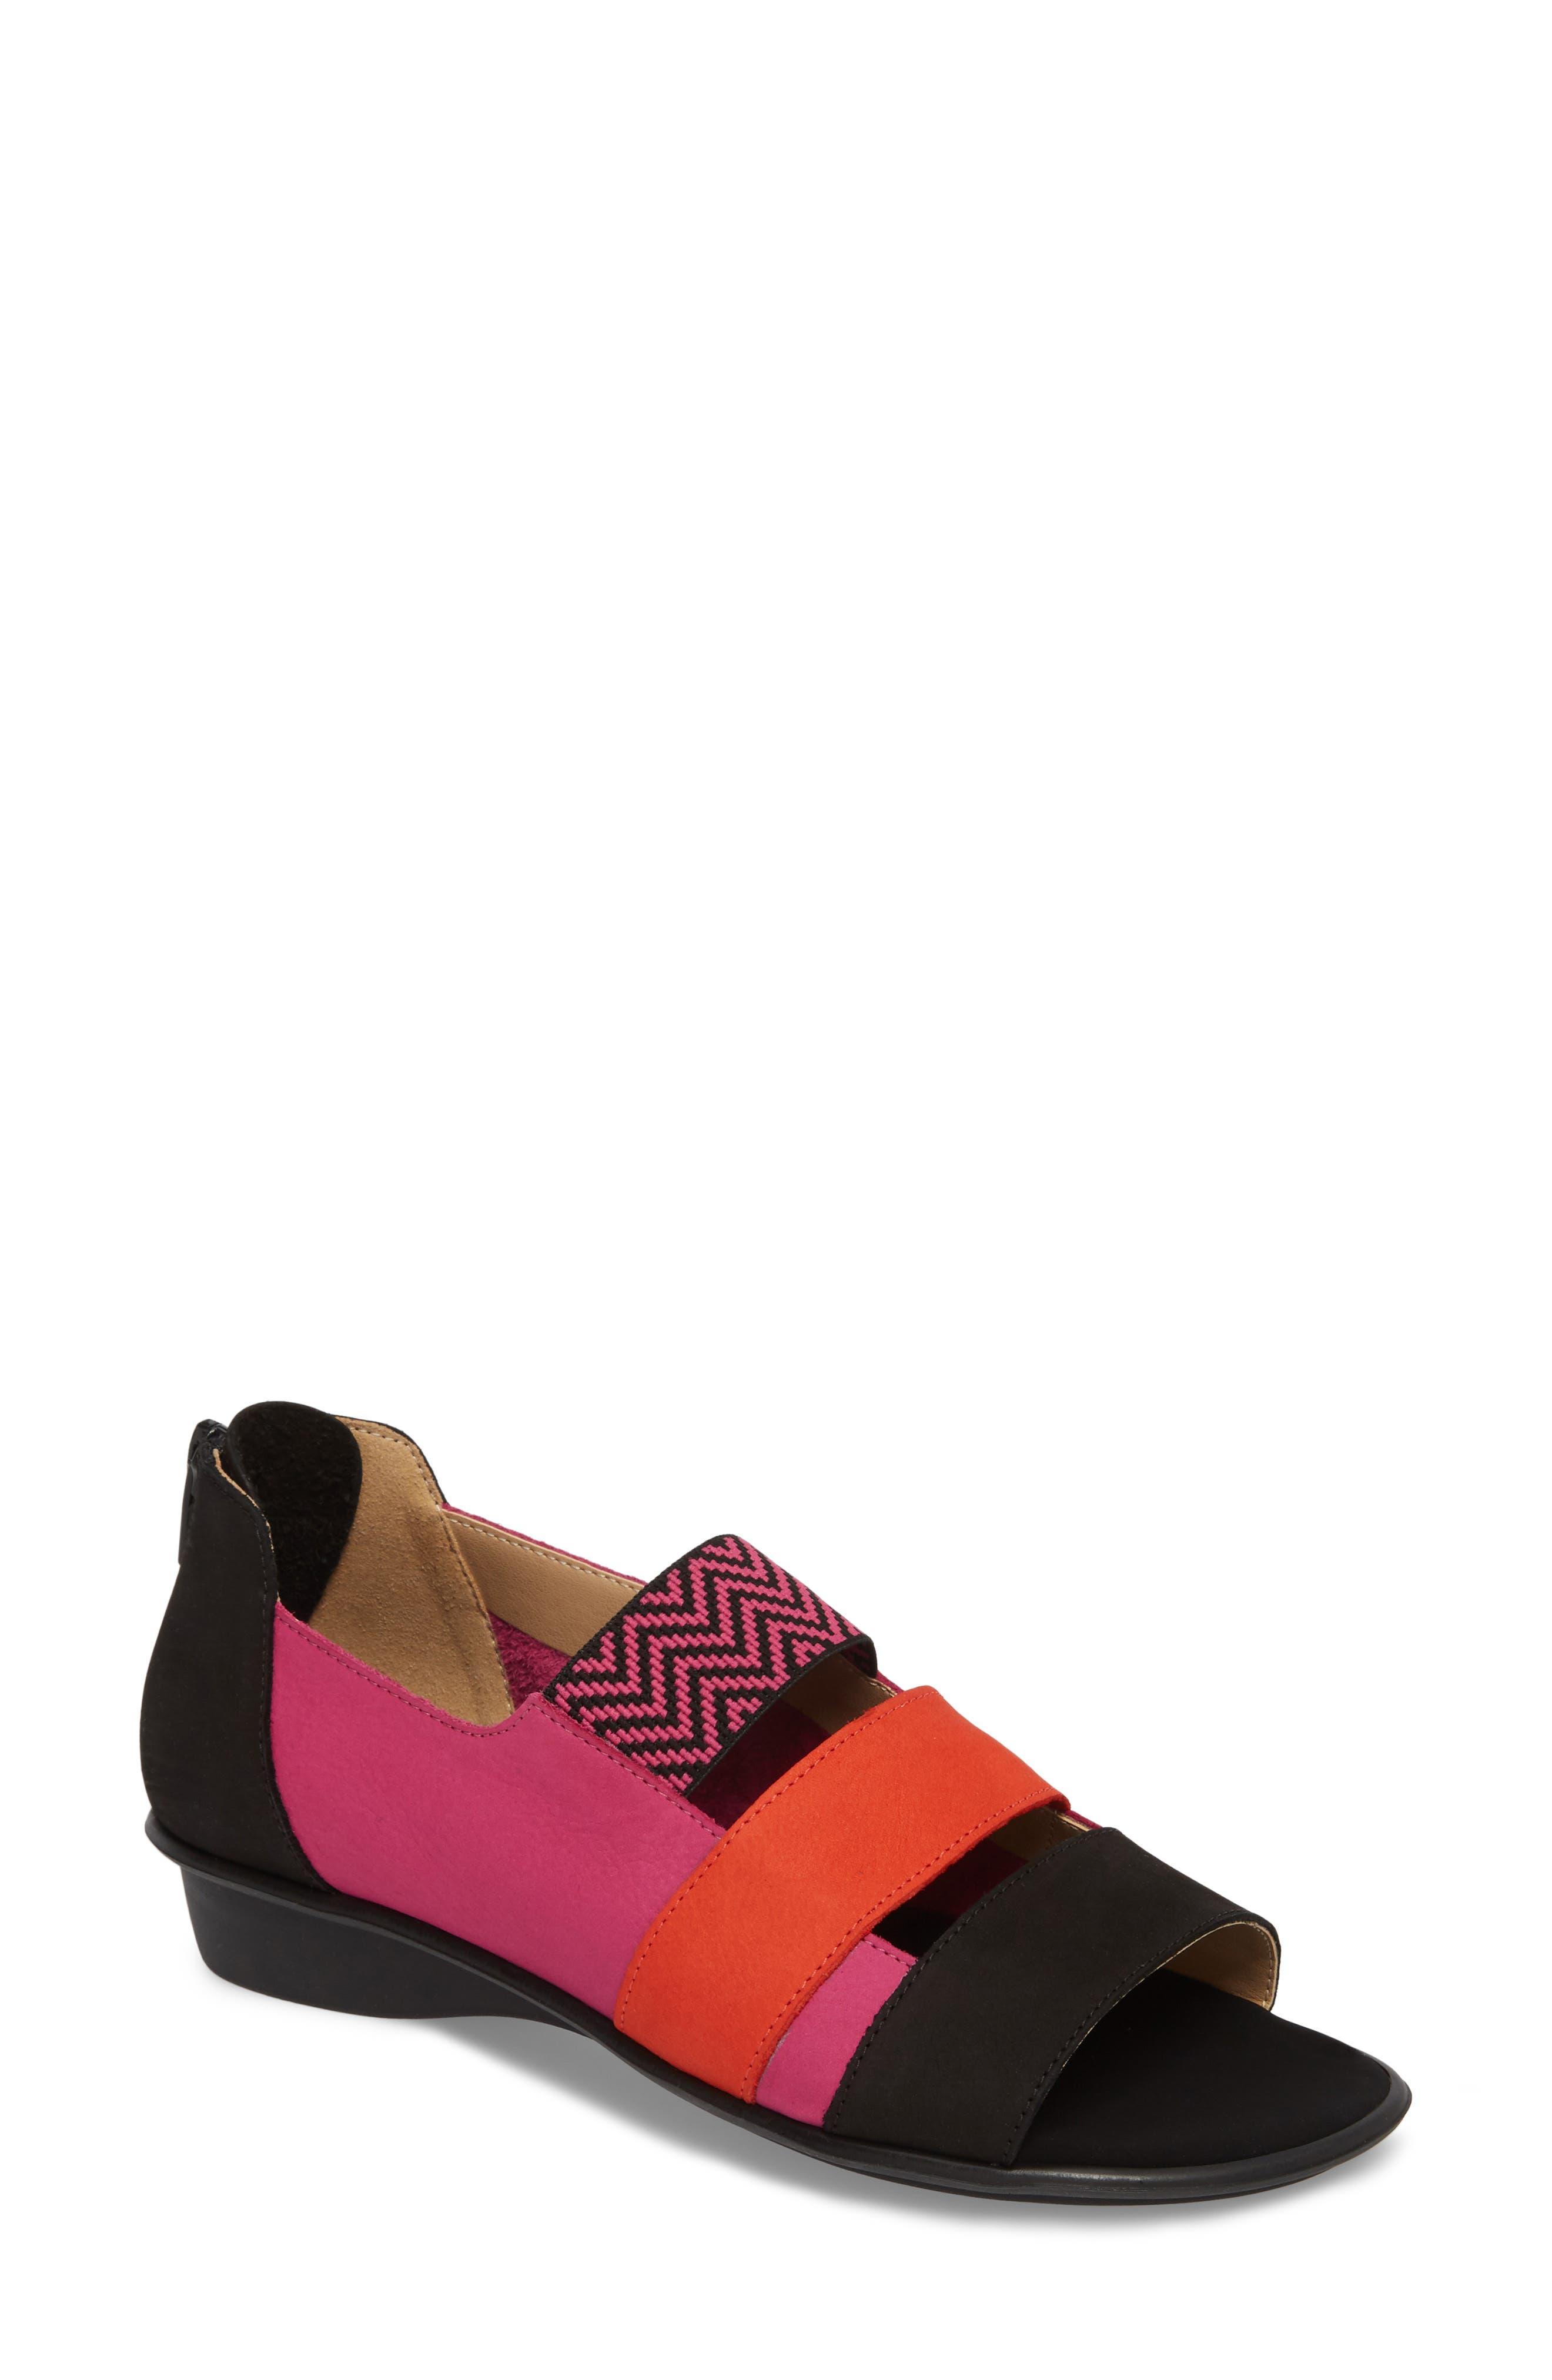 Sesto Meucci Elise Peep Toe Sandal, Pink